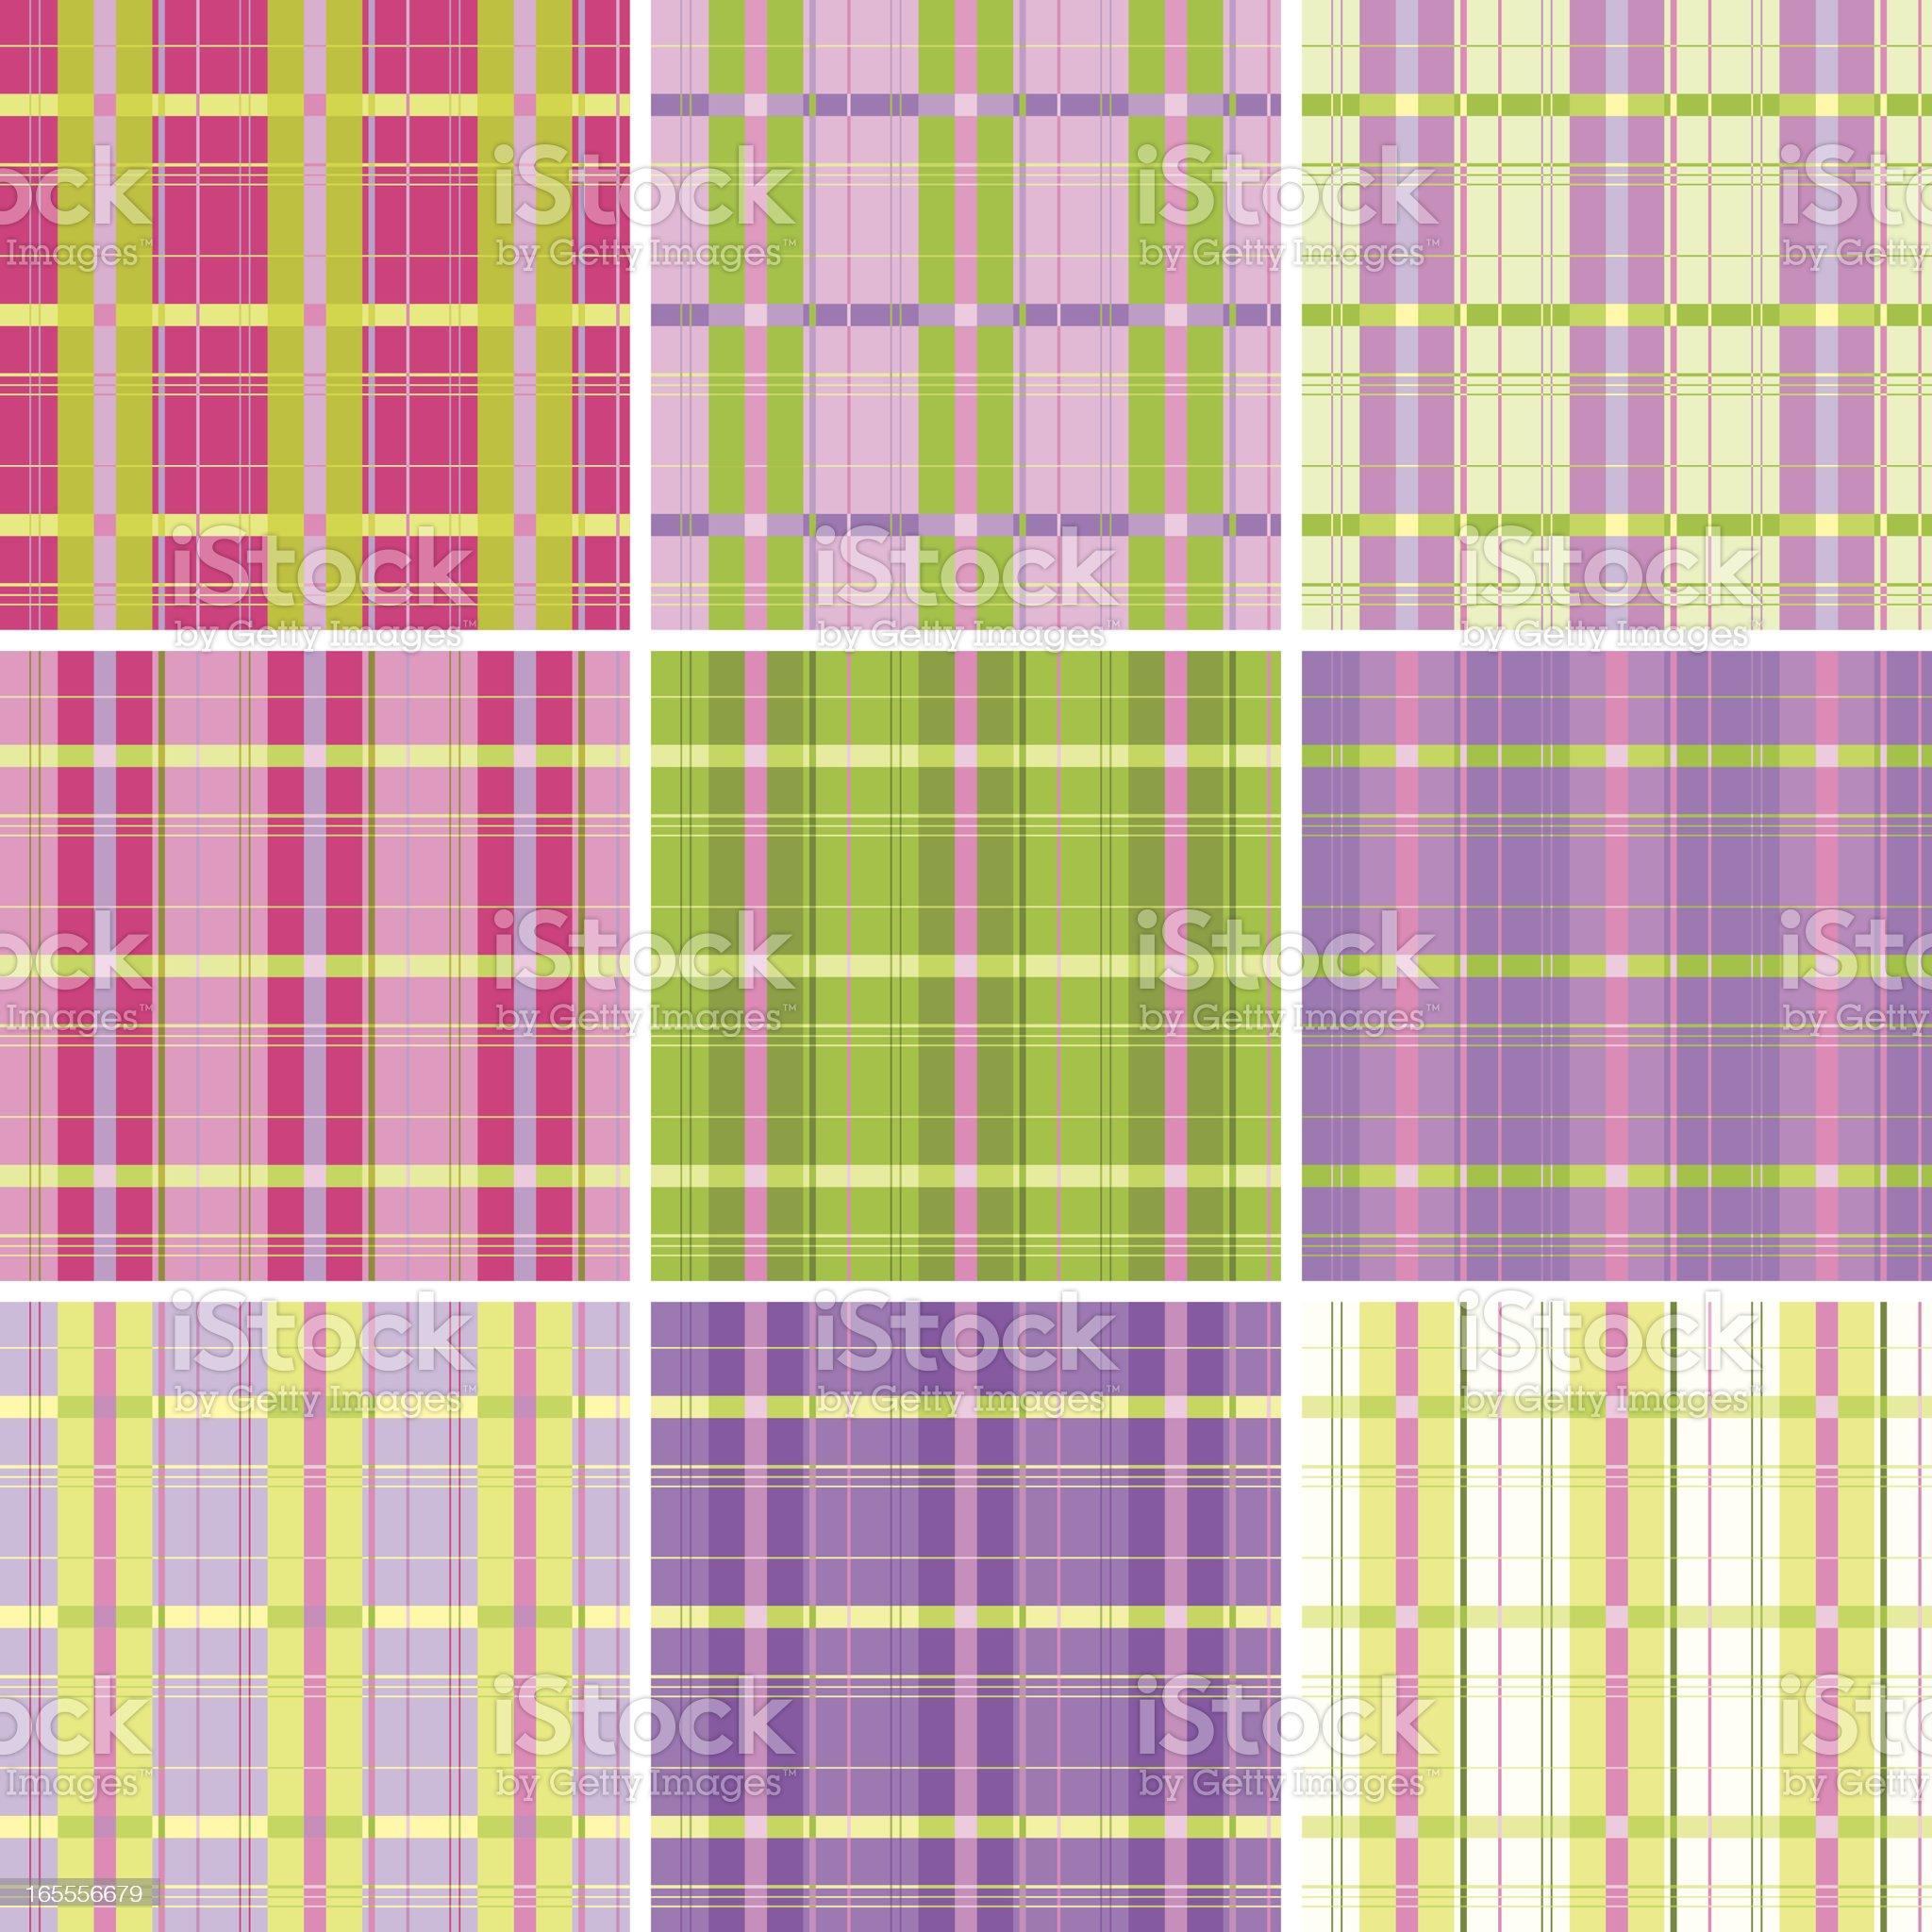 Seamless plaid pattern royalty-free stock vector art